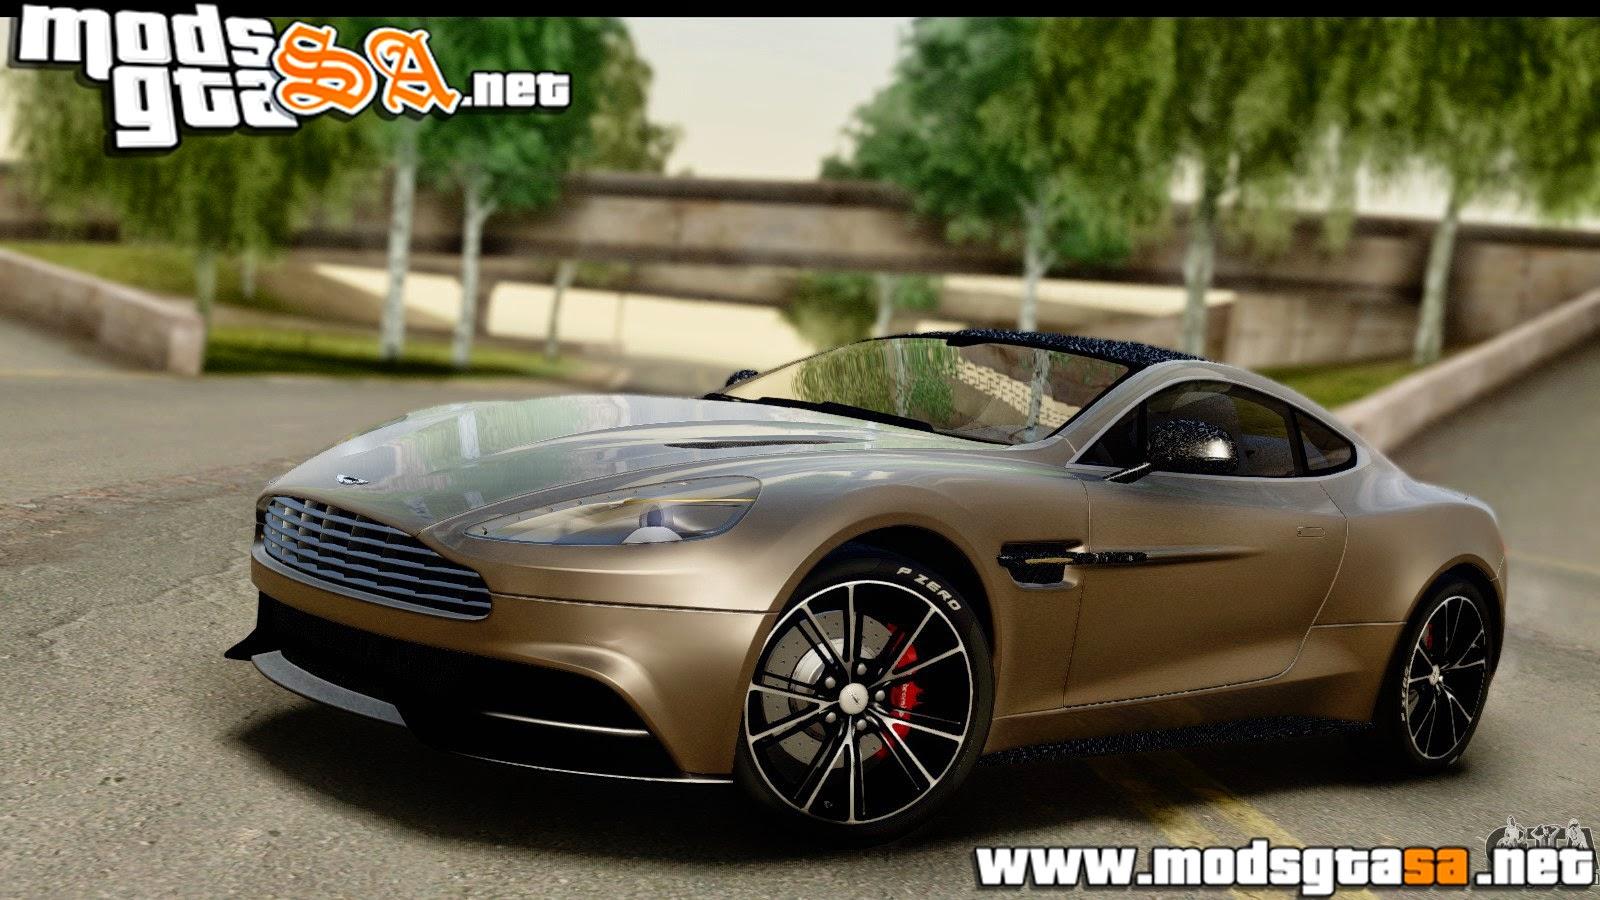 SA - Aston Martin Vanquish 2013 Road Version